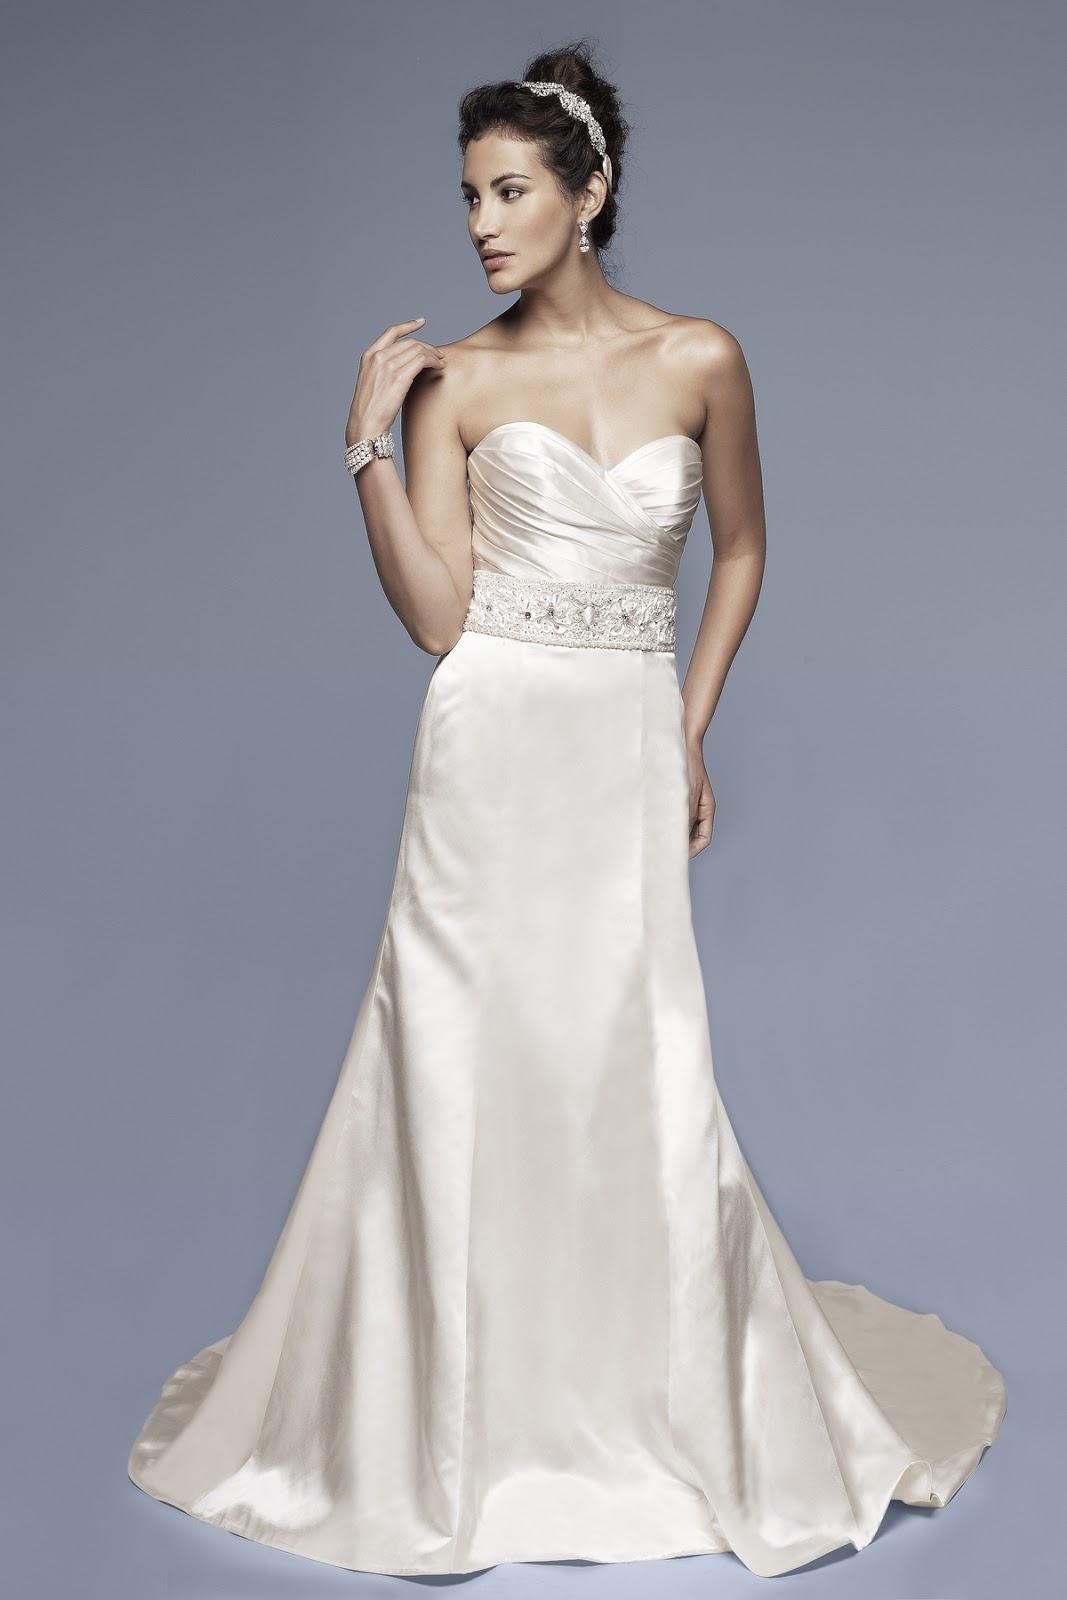 Vestidos de novia para segunda boda – Hermosos vestidos